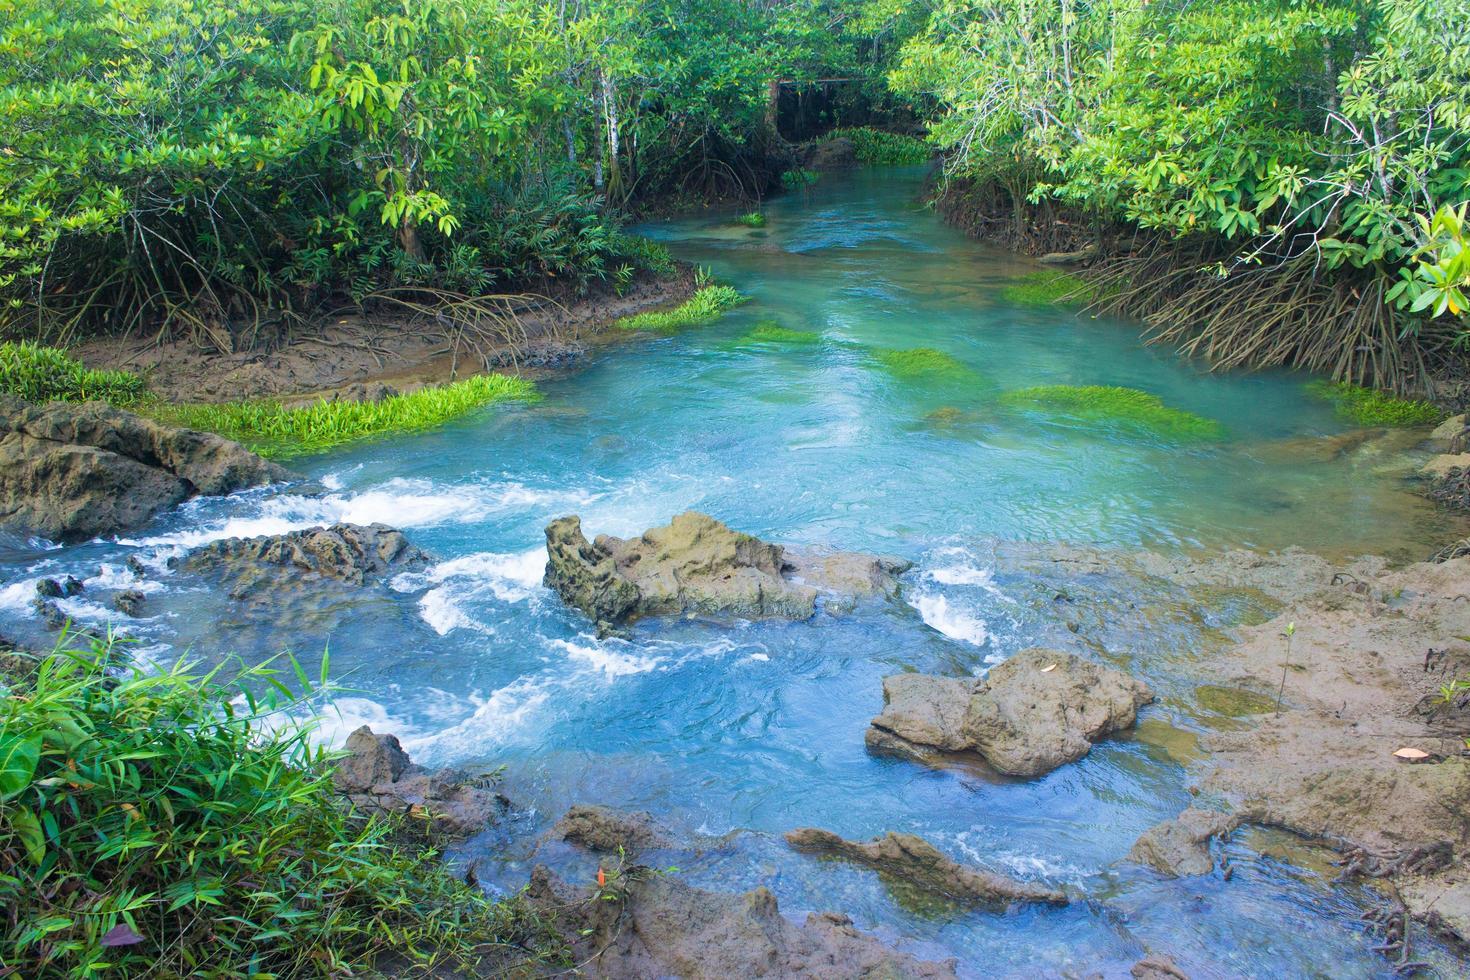 mangrovebos en een rivier foto